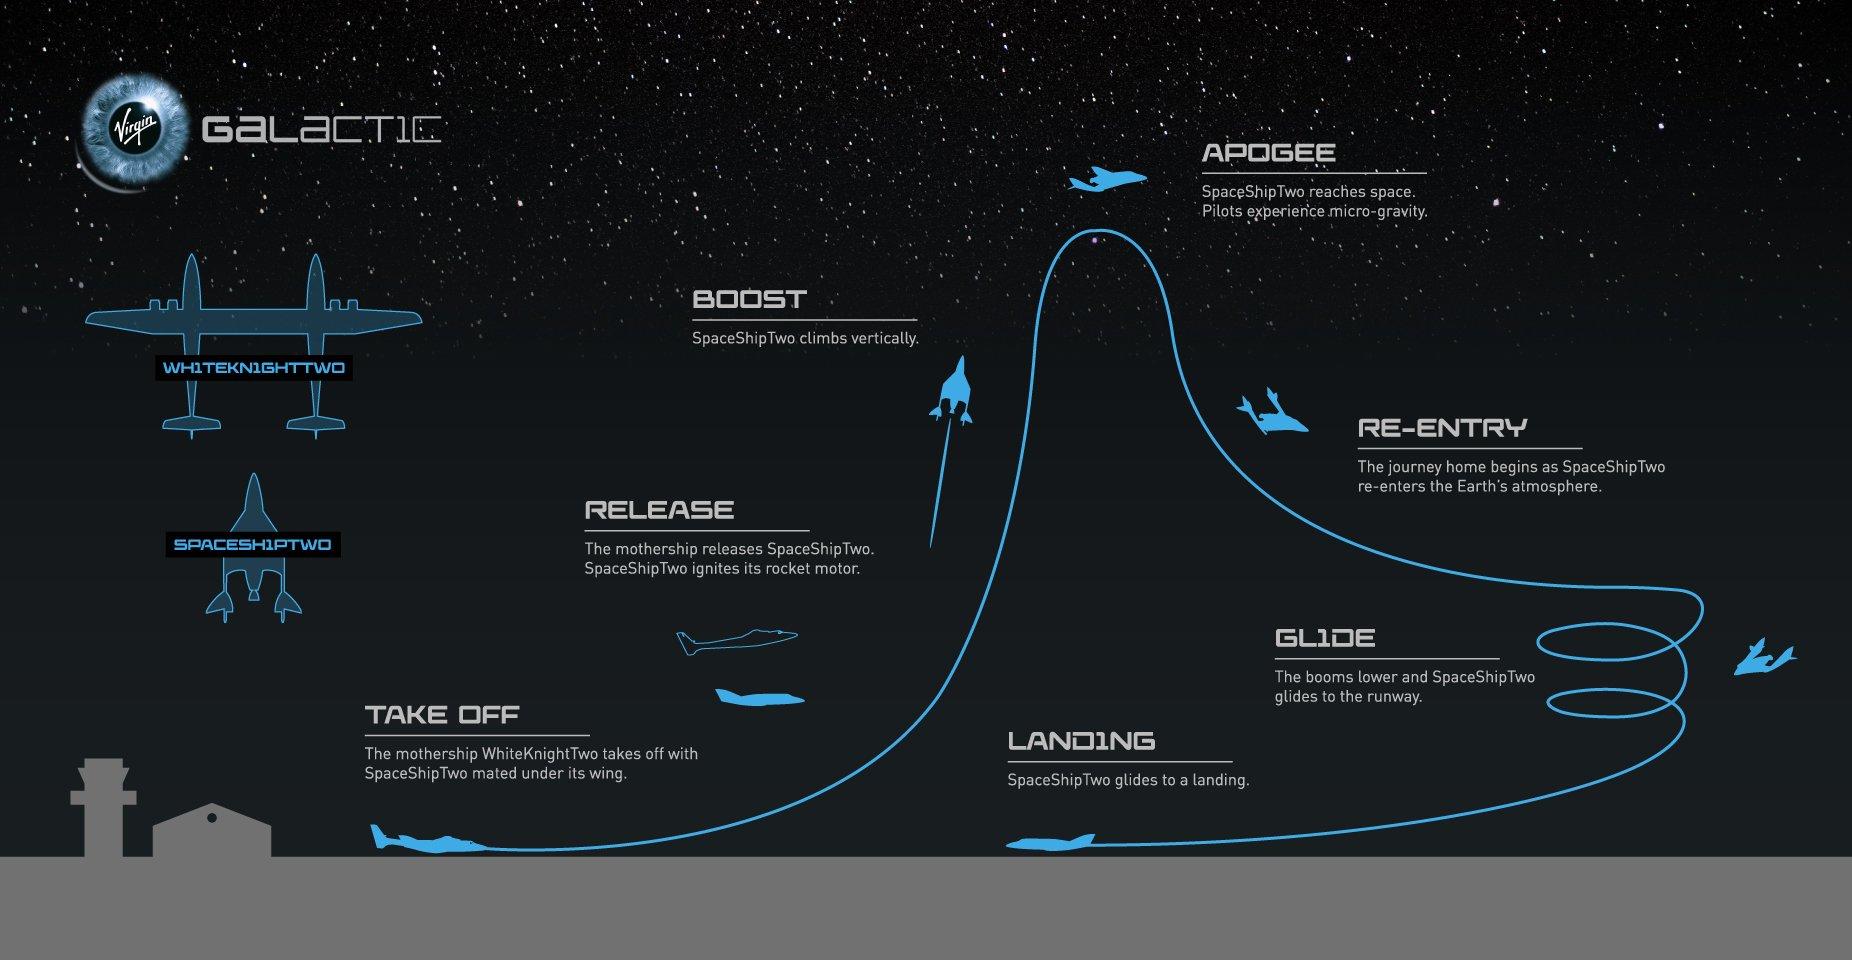 spaceship 2 trajectory